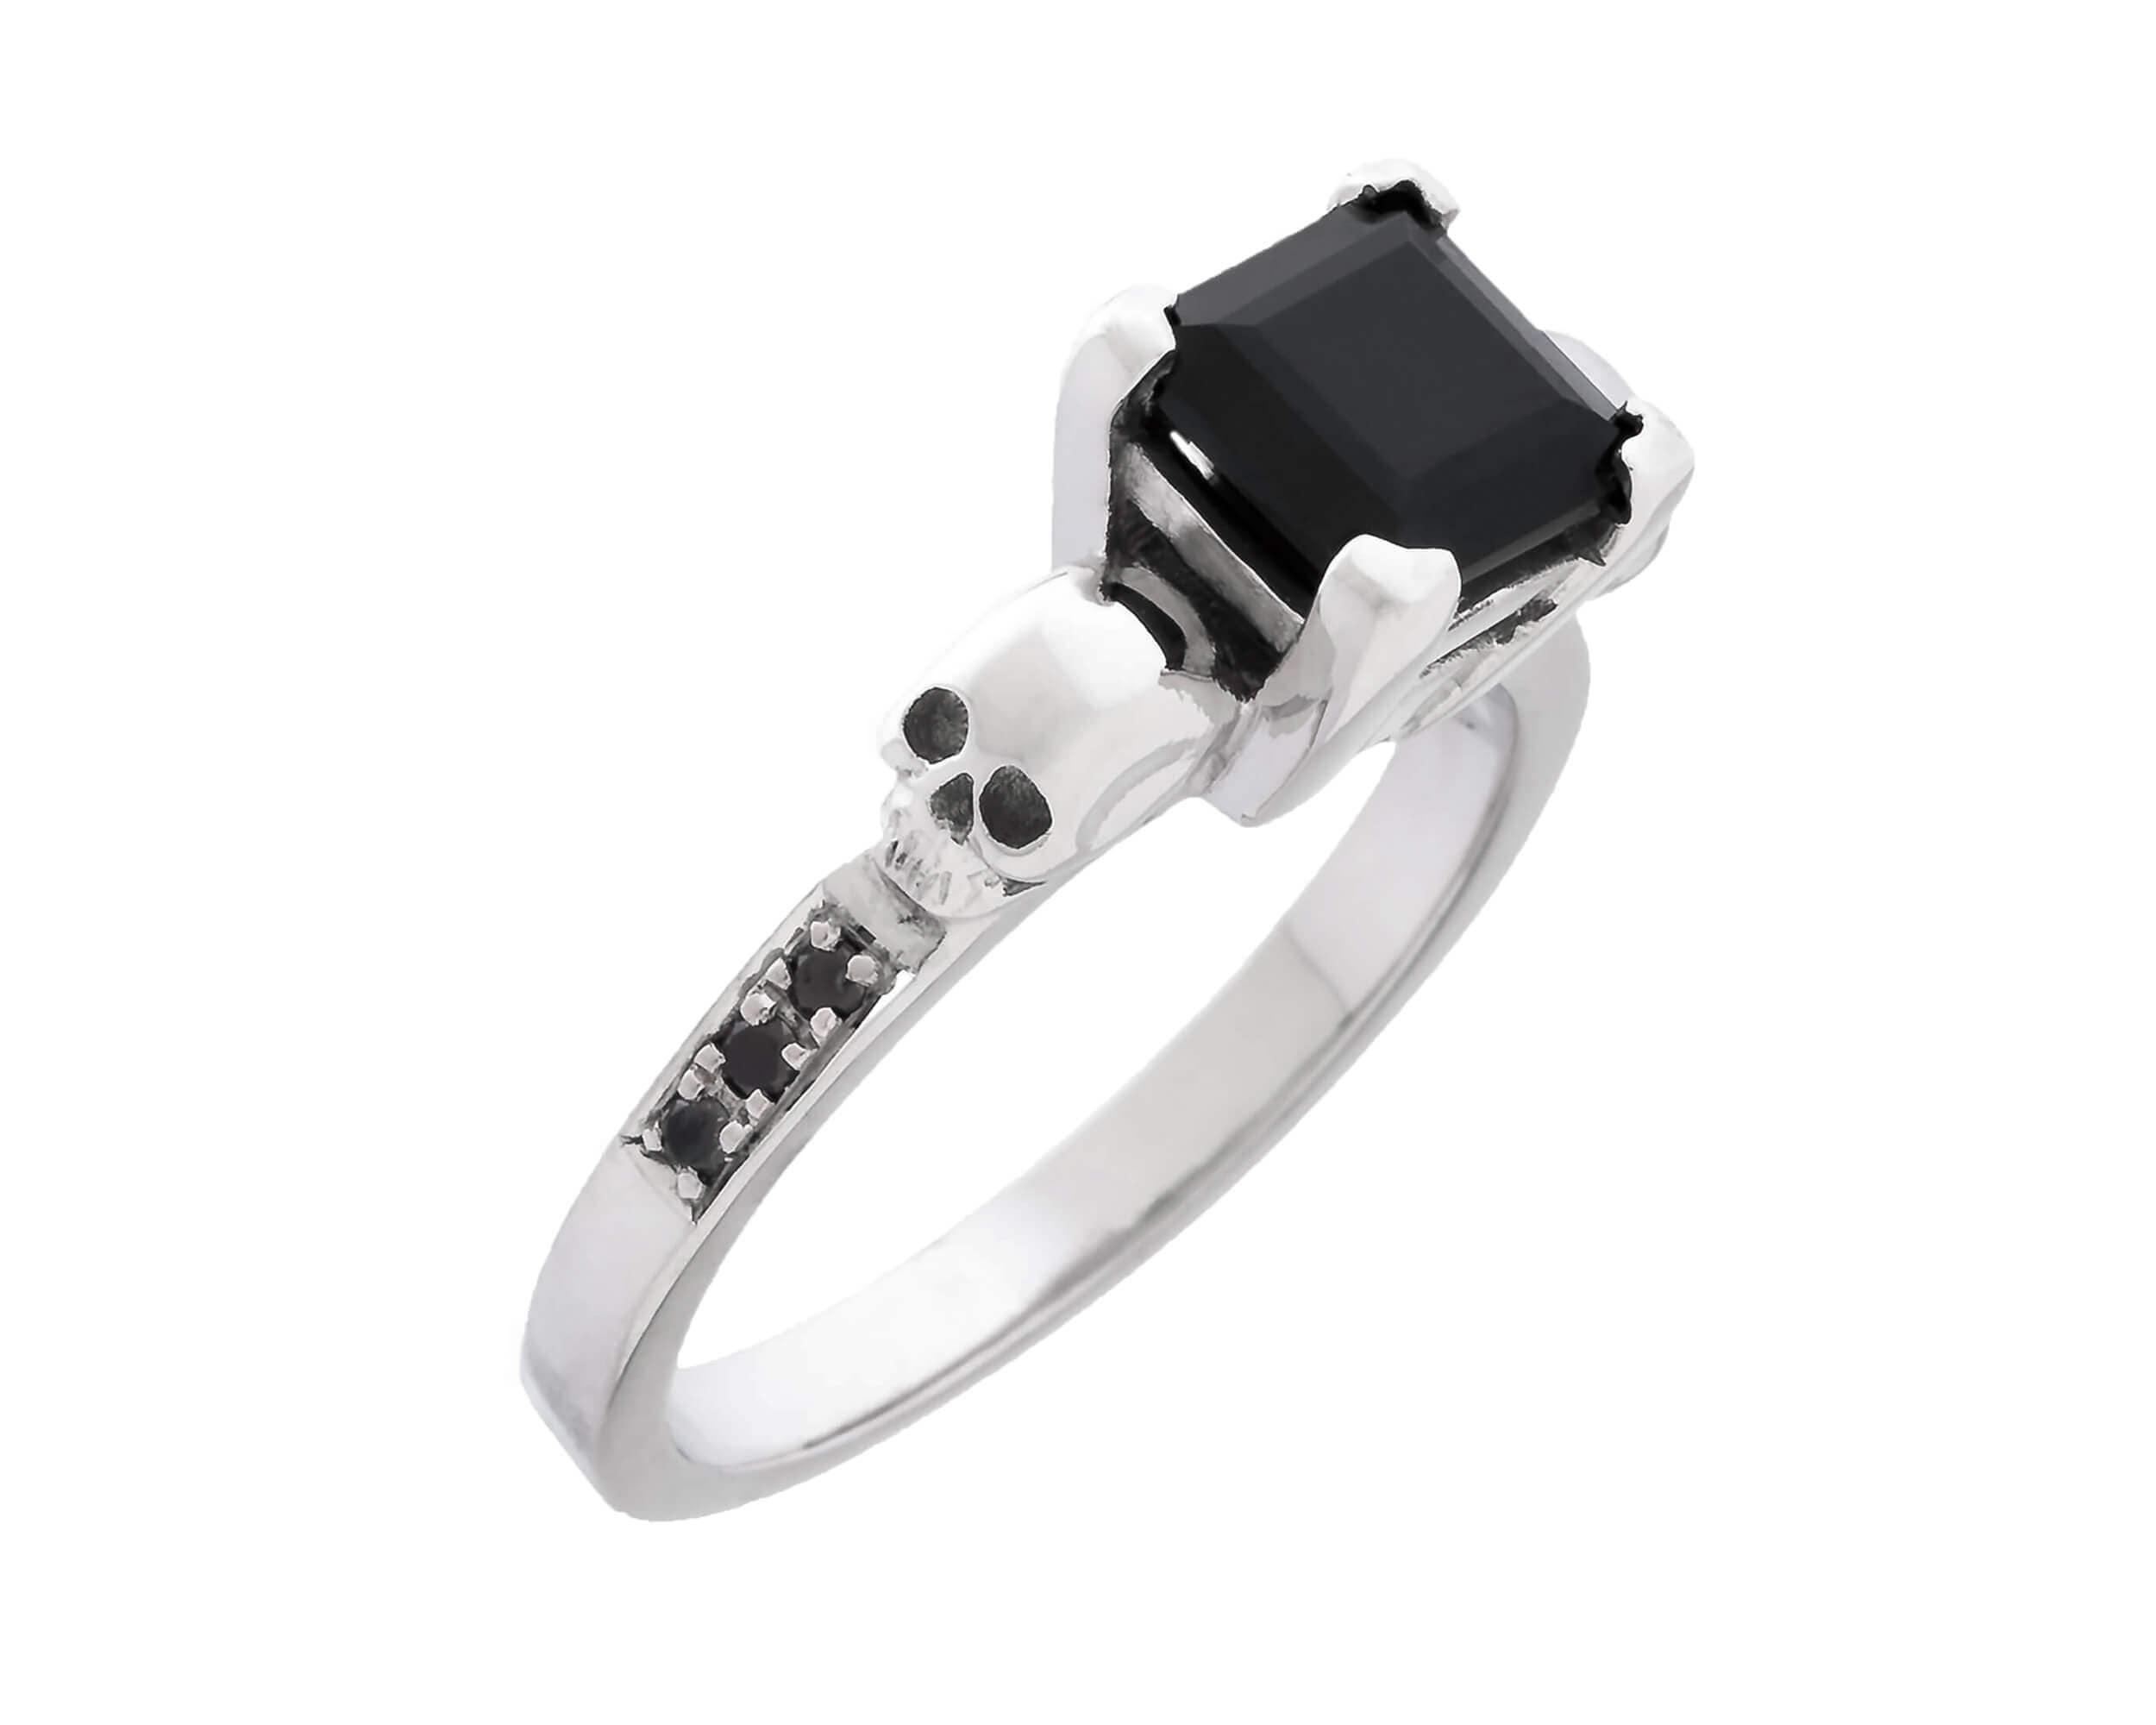 Valentines Skull Ring READY TO SHIP Black Moissanite and Sterling Lab Diamond Ring Memento Mori Gift Size 5.5